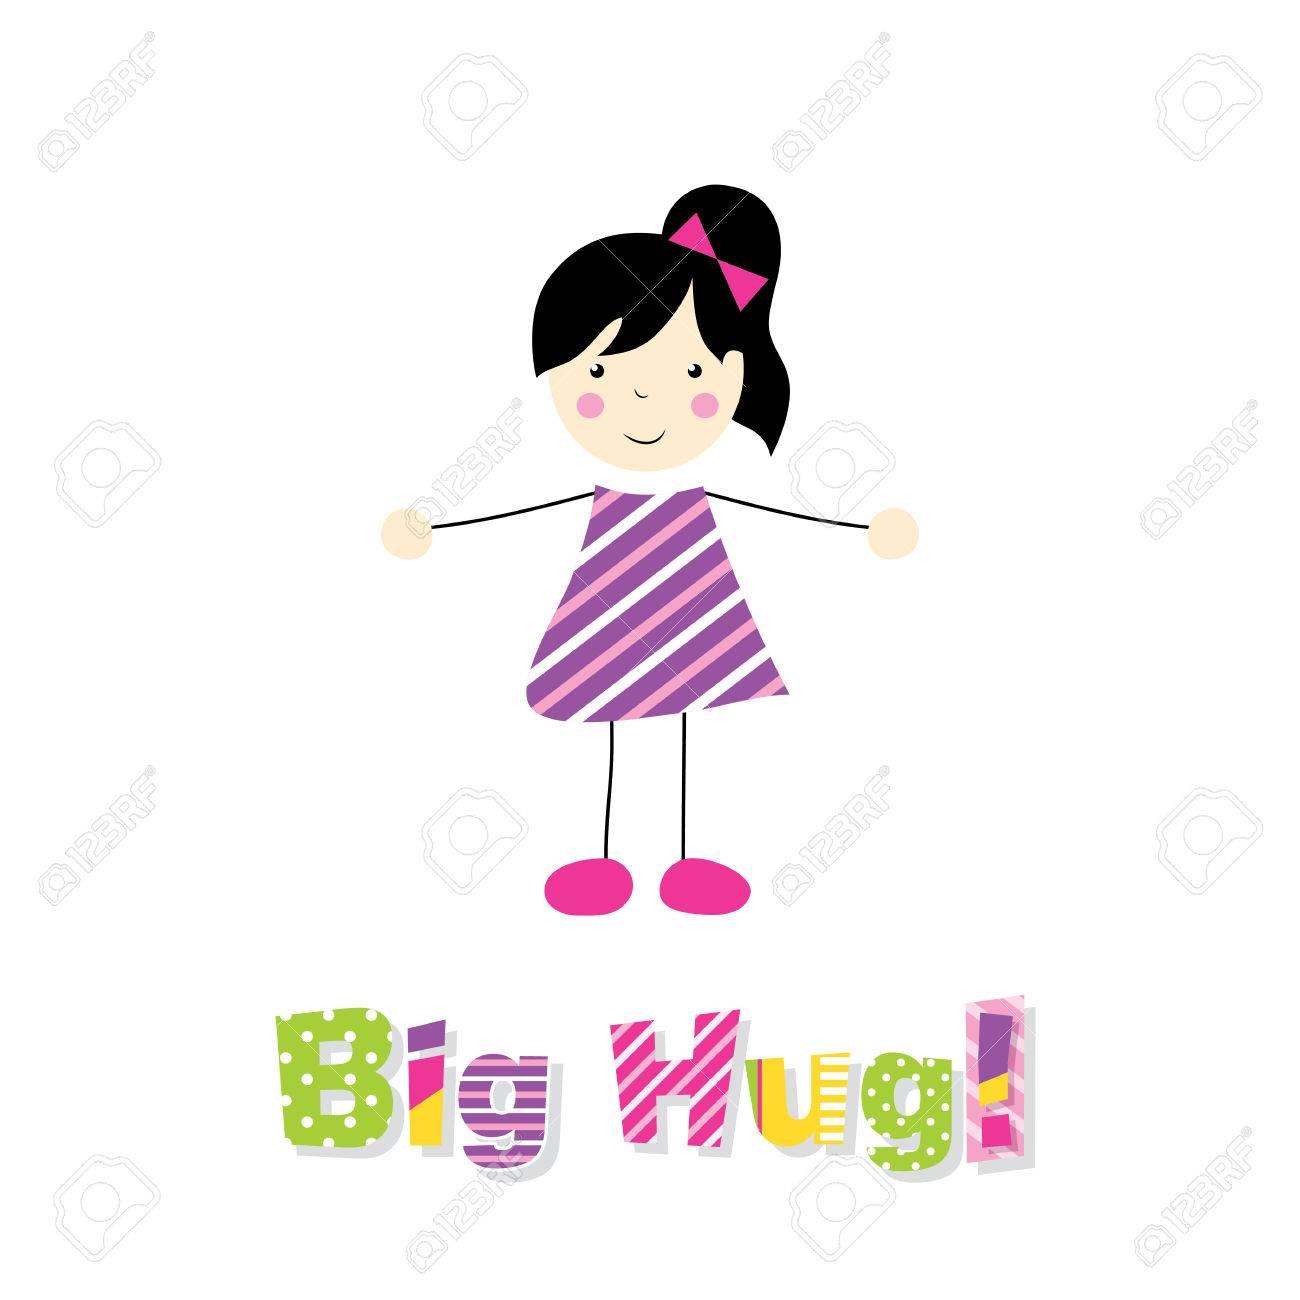 Free hugs black girl big